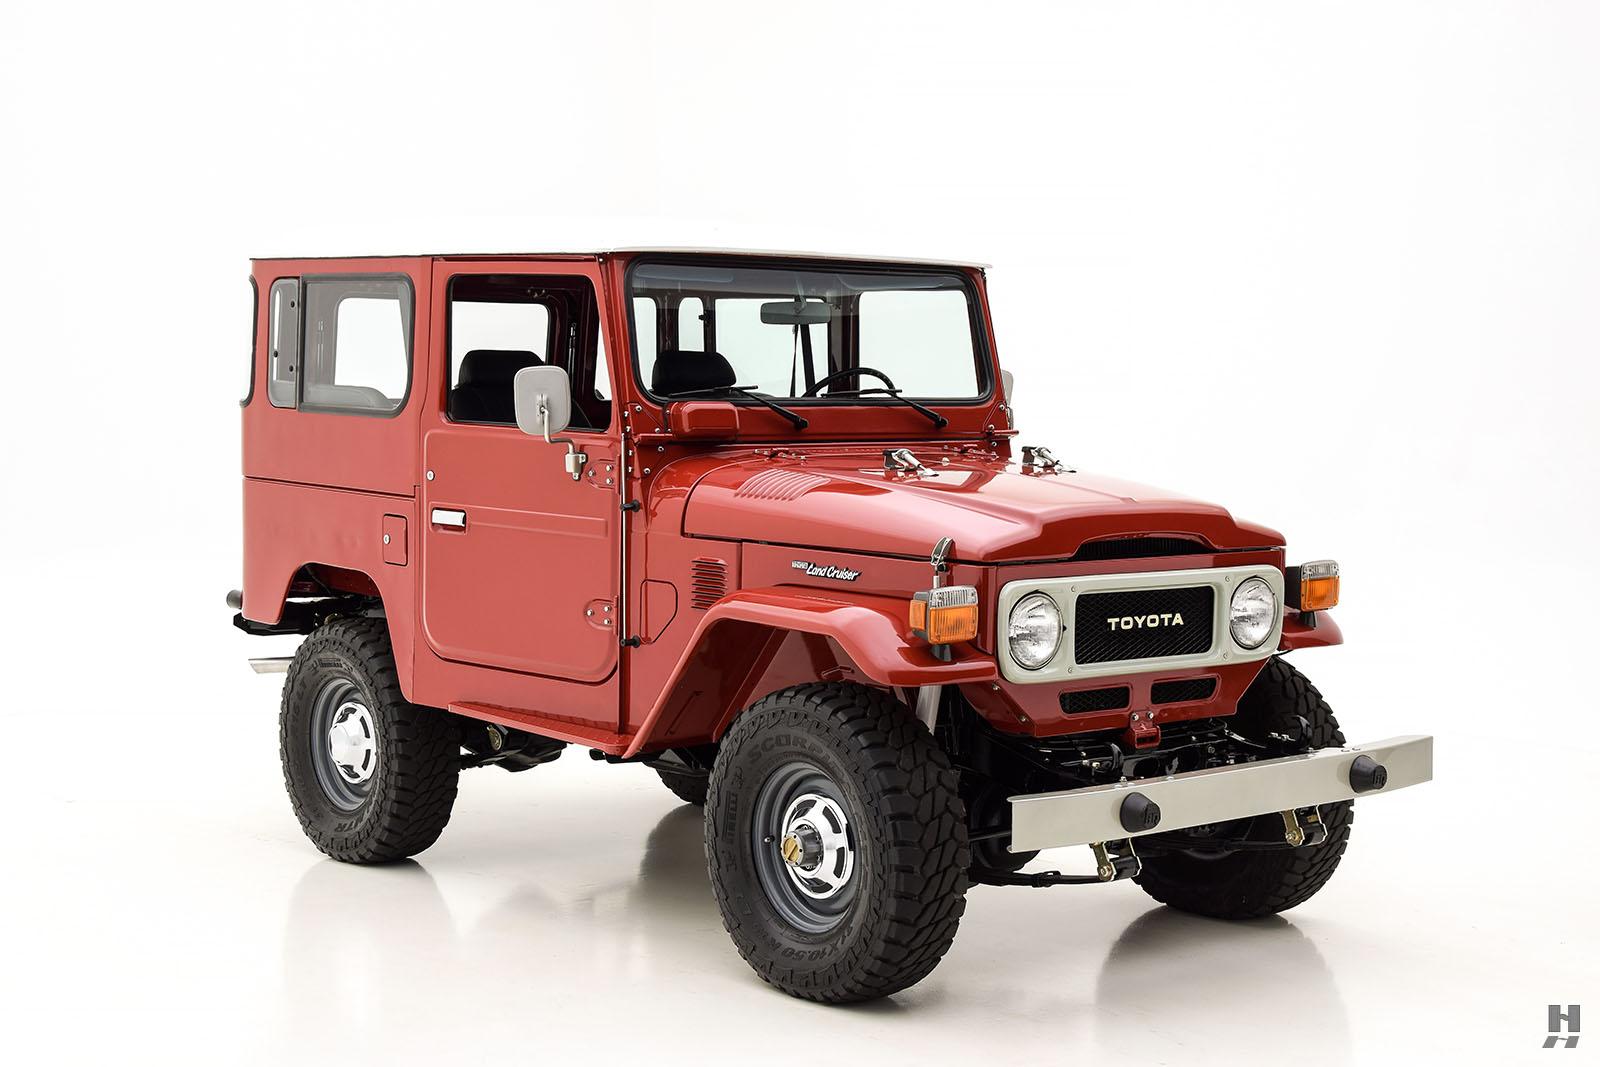 1982 Toyota Fj40 Land Cruiser Hyman Ltd Classic Cars